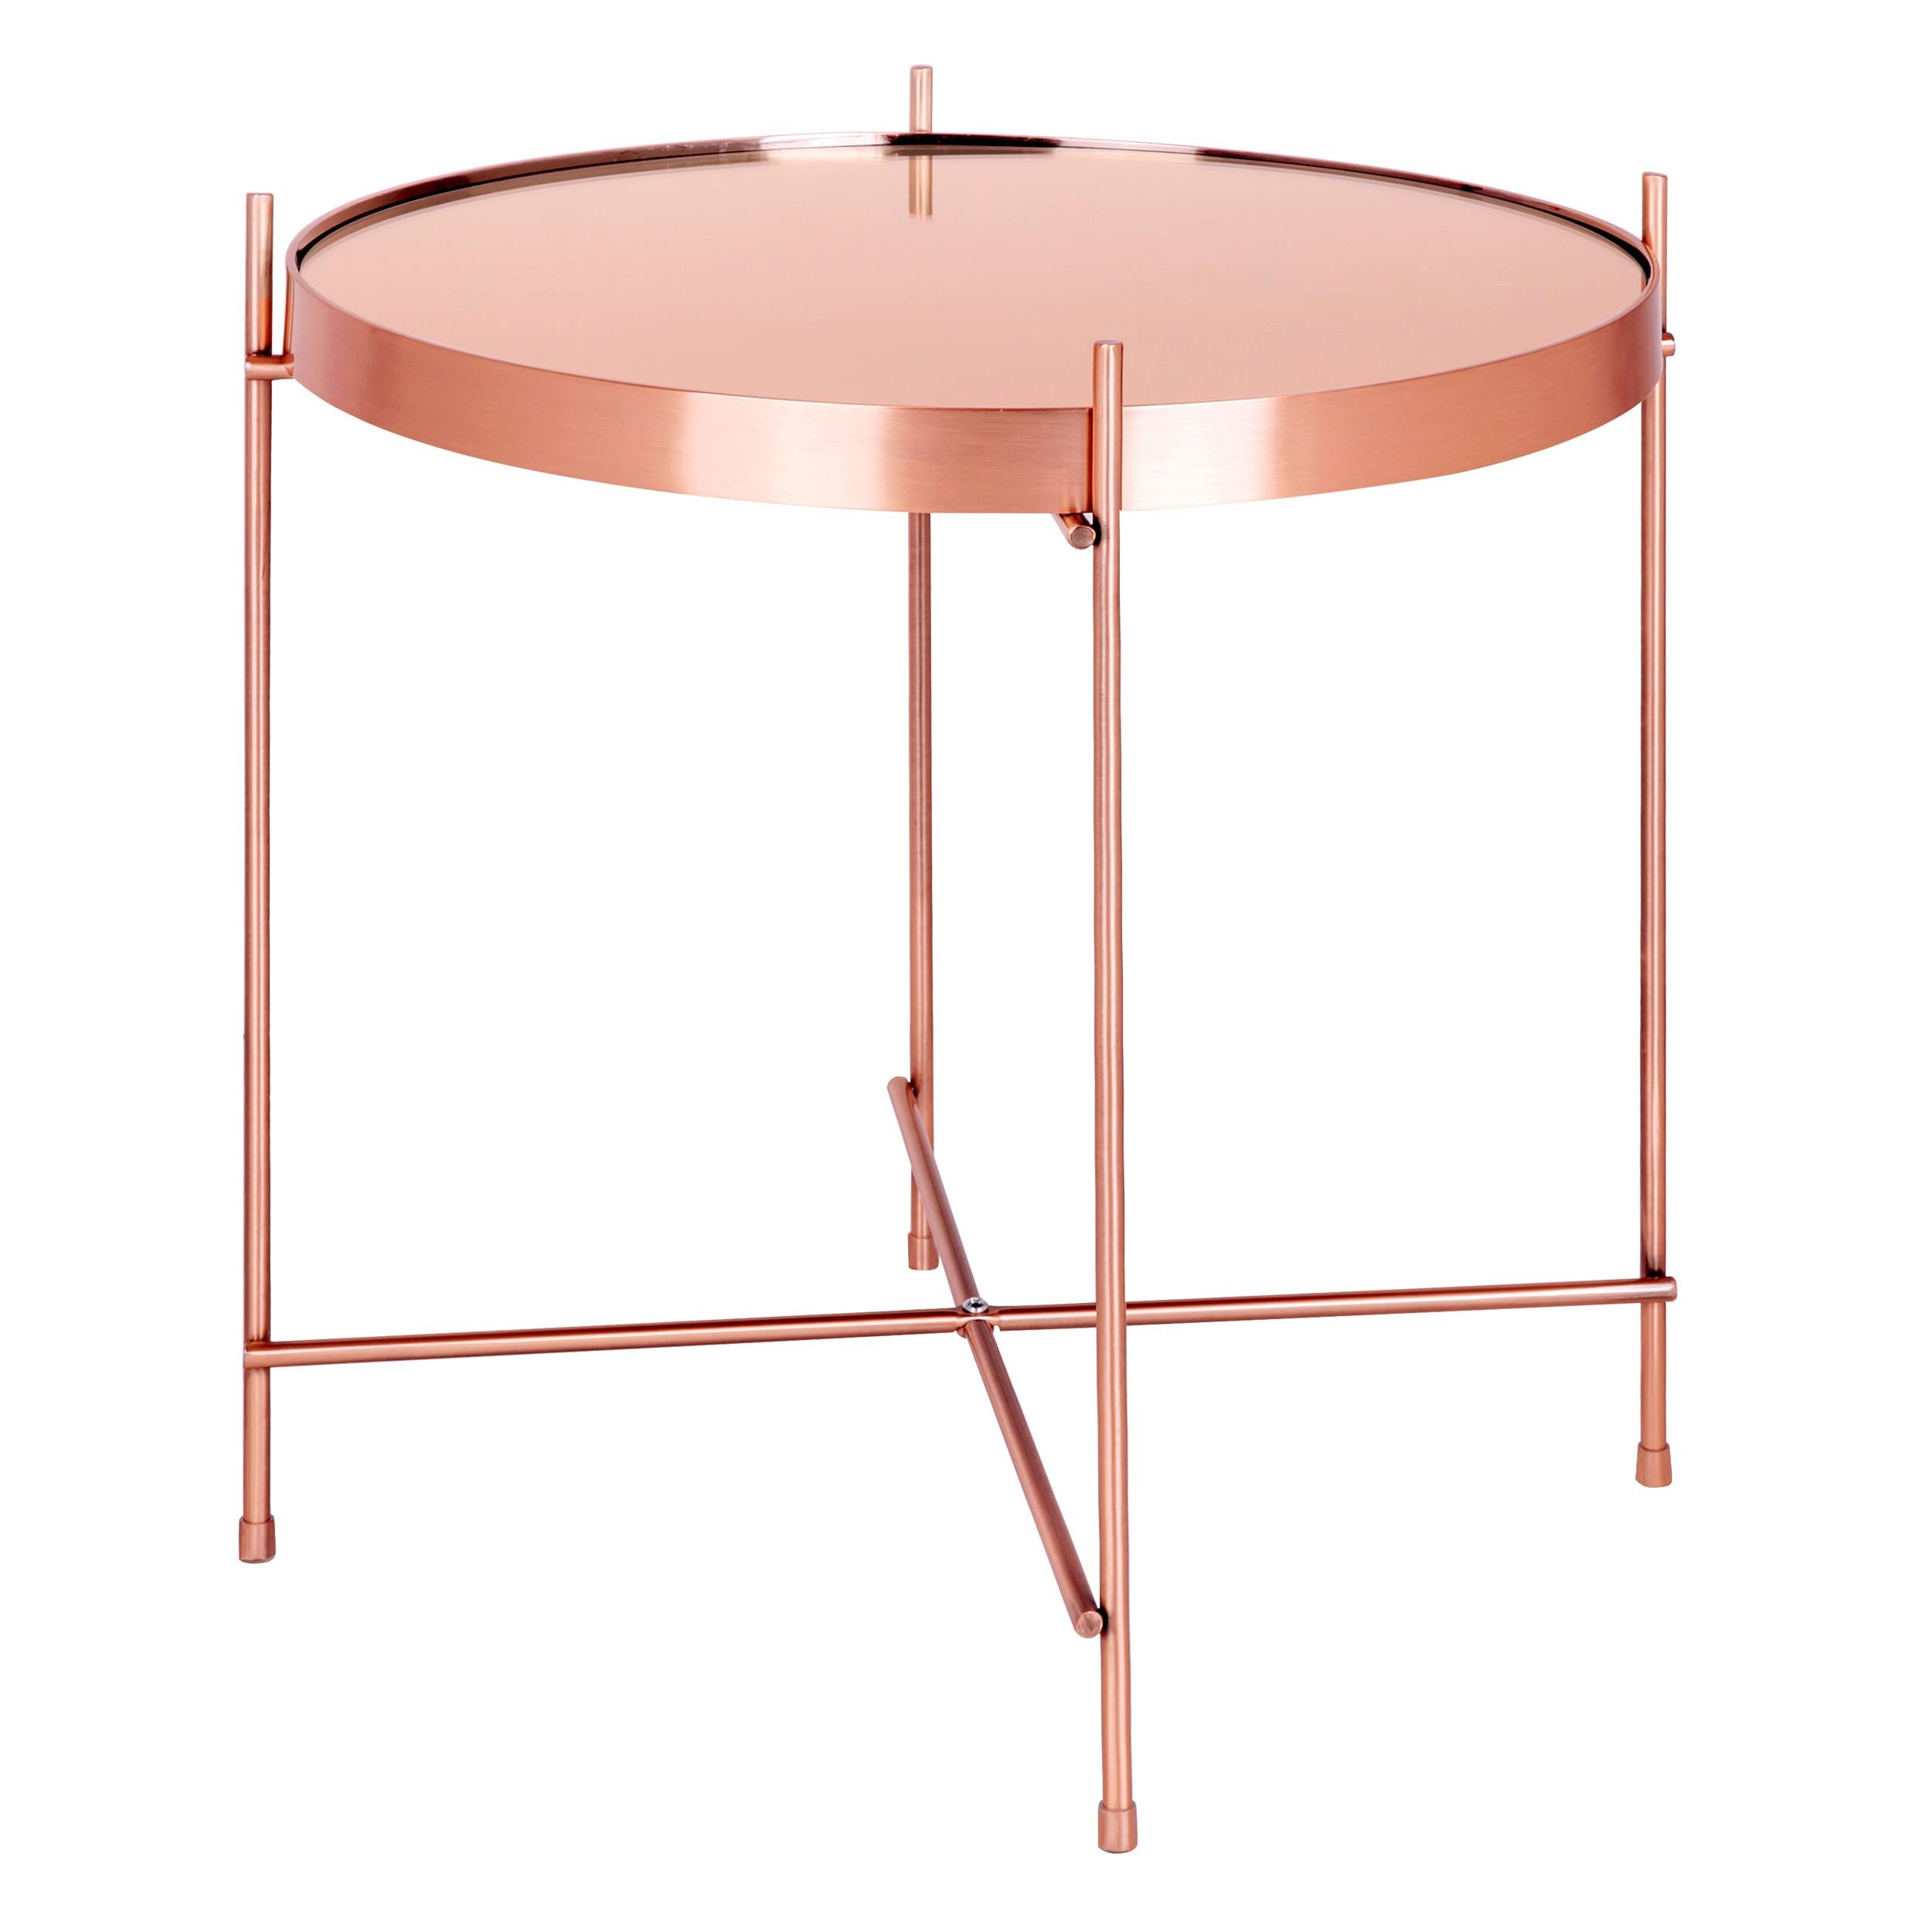 table basse ronde valdo cuivre s optez pour nos tables basses rondes valdo cuivre s rdv d co. Black Bedroom Furniture Sets. Home Design Ideas